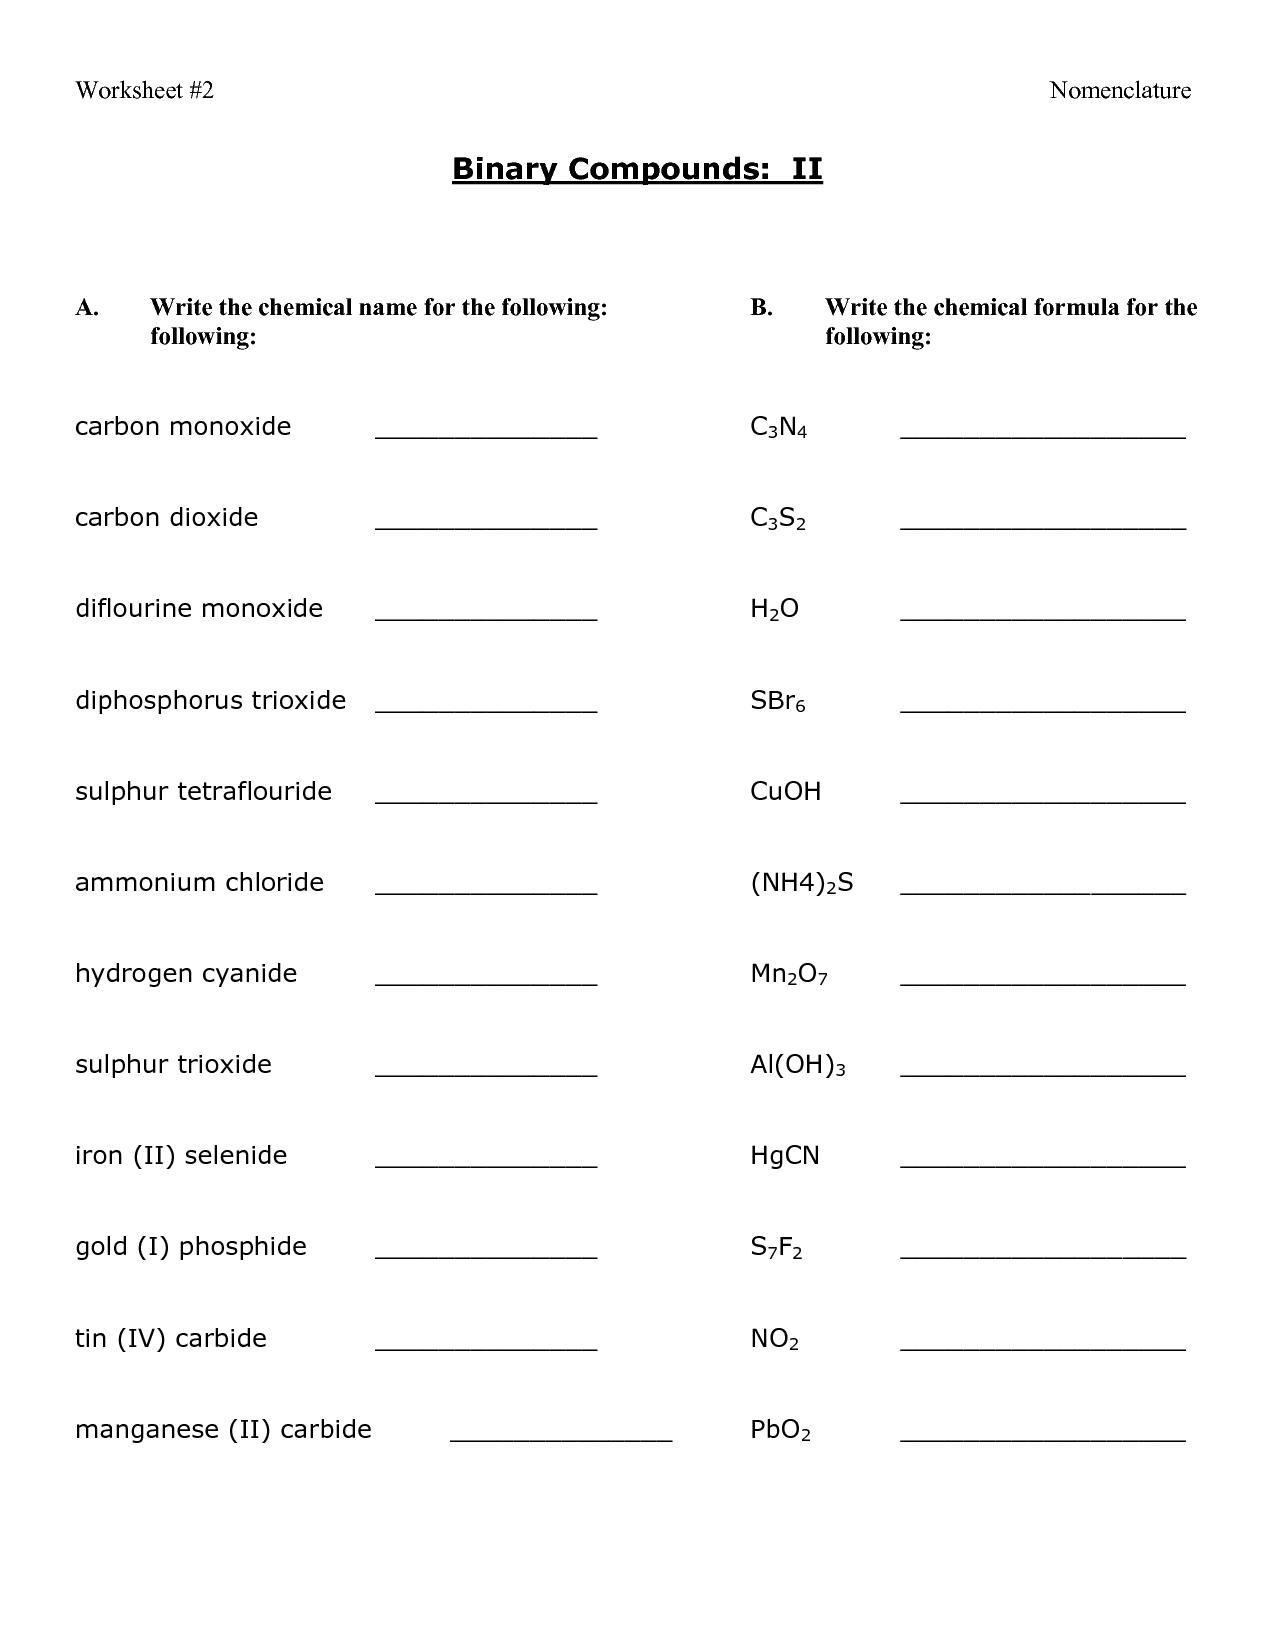 12 Best Images Of Compound Names And Formulas Worksheet